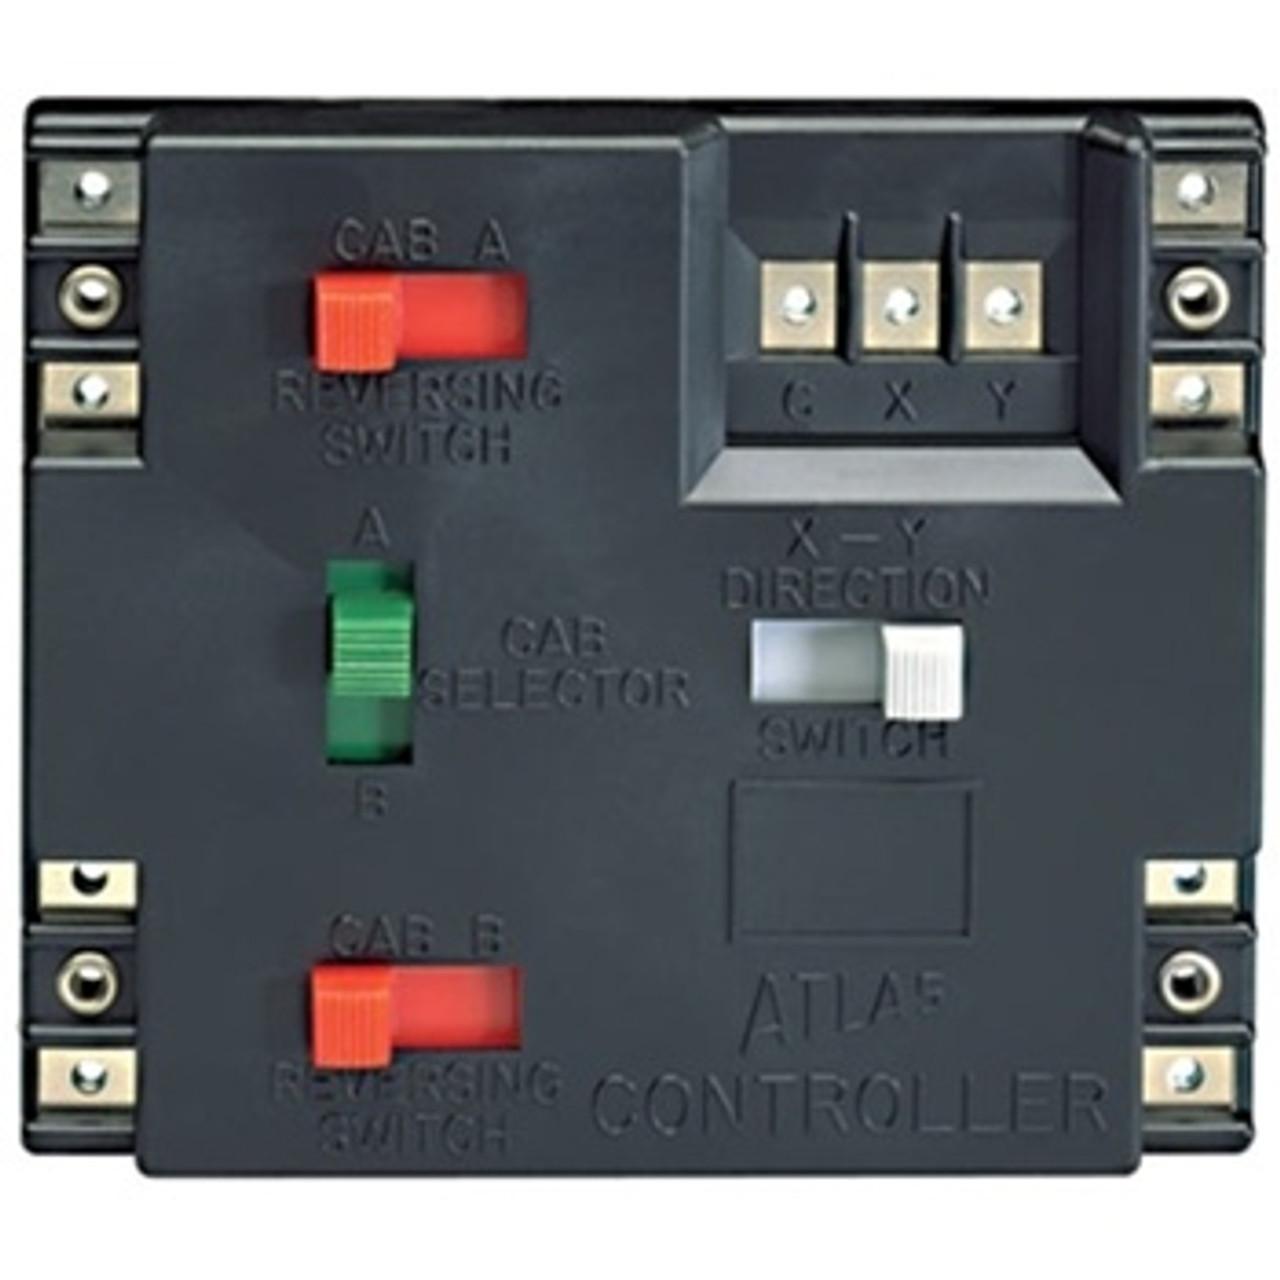 hight resolution of model train atlas 220 controller modeltrainstuff atlas model train switch track wiring on wiring voltage selector